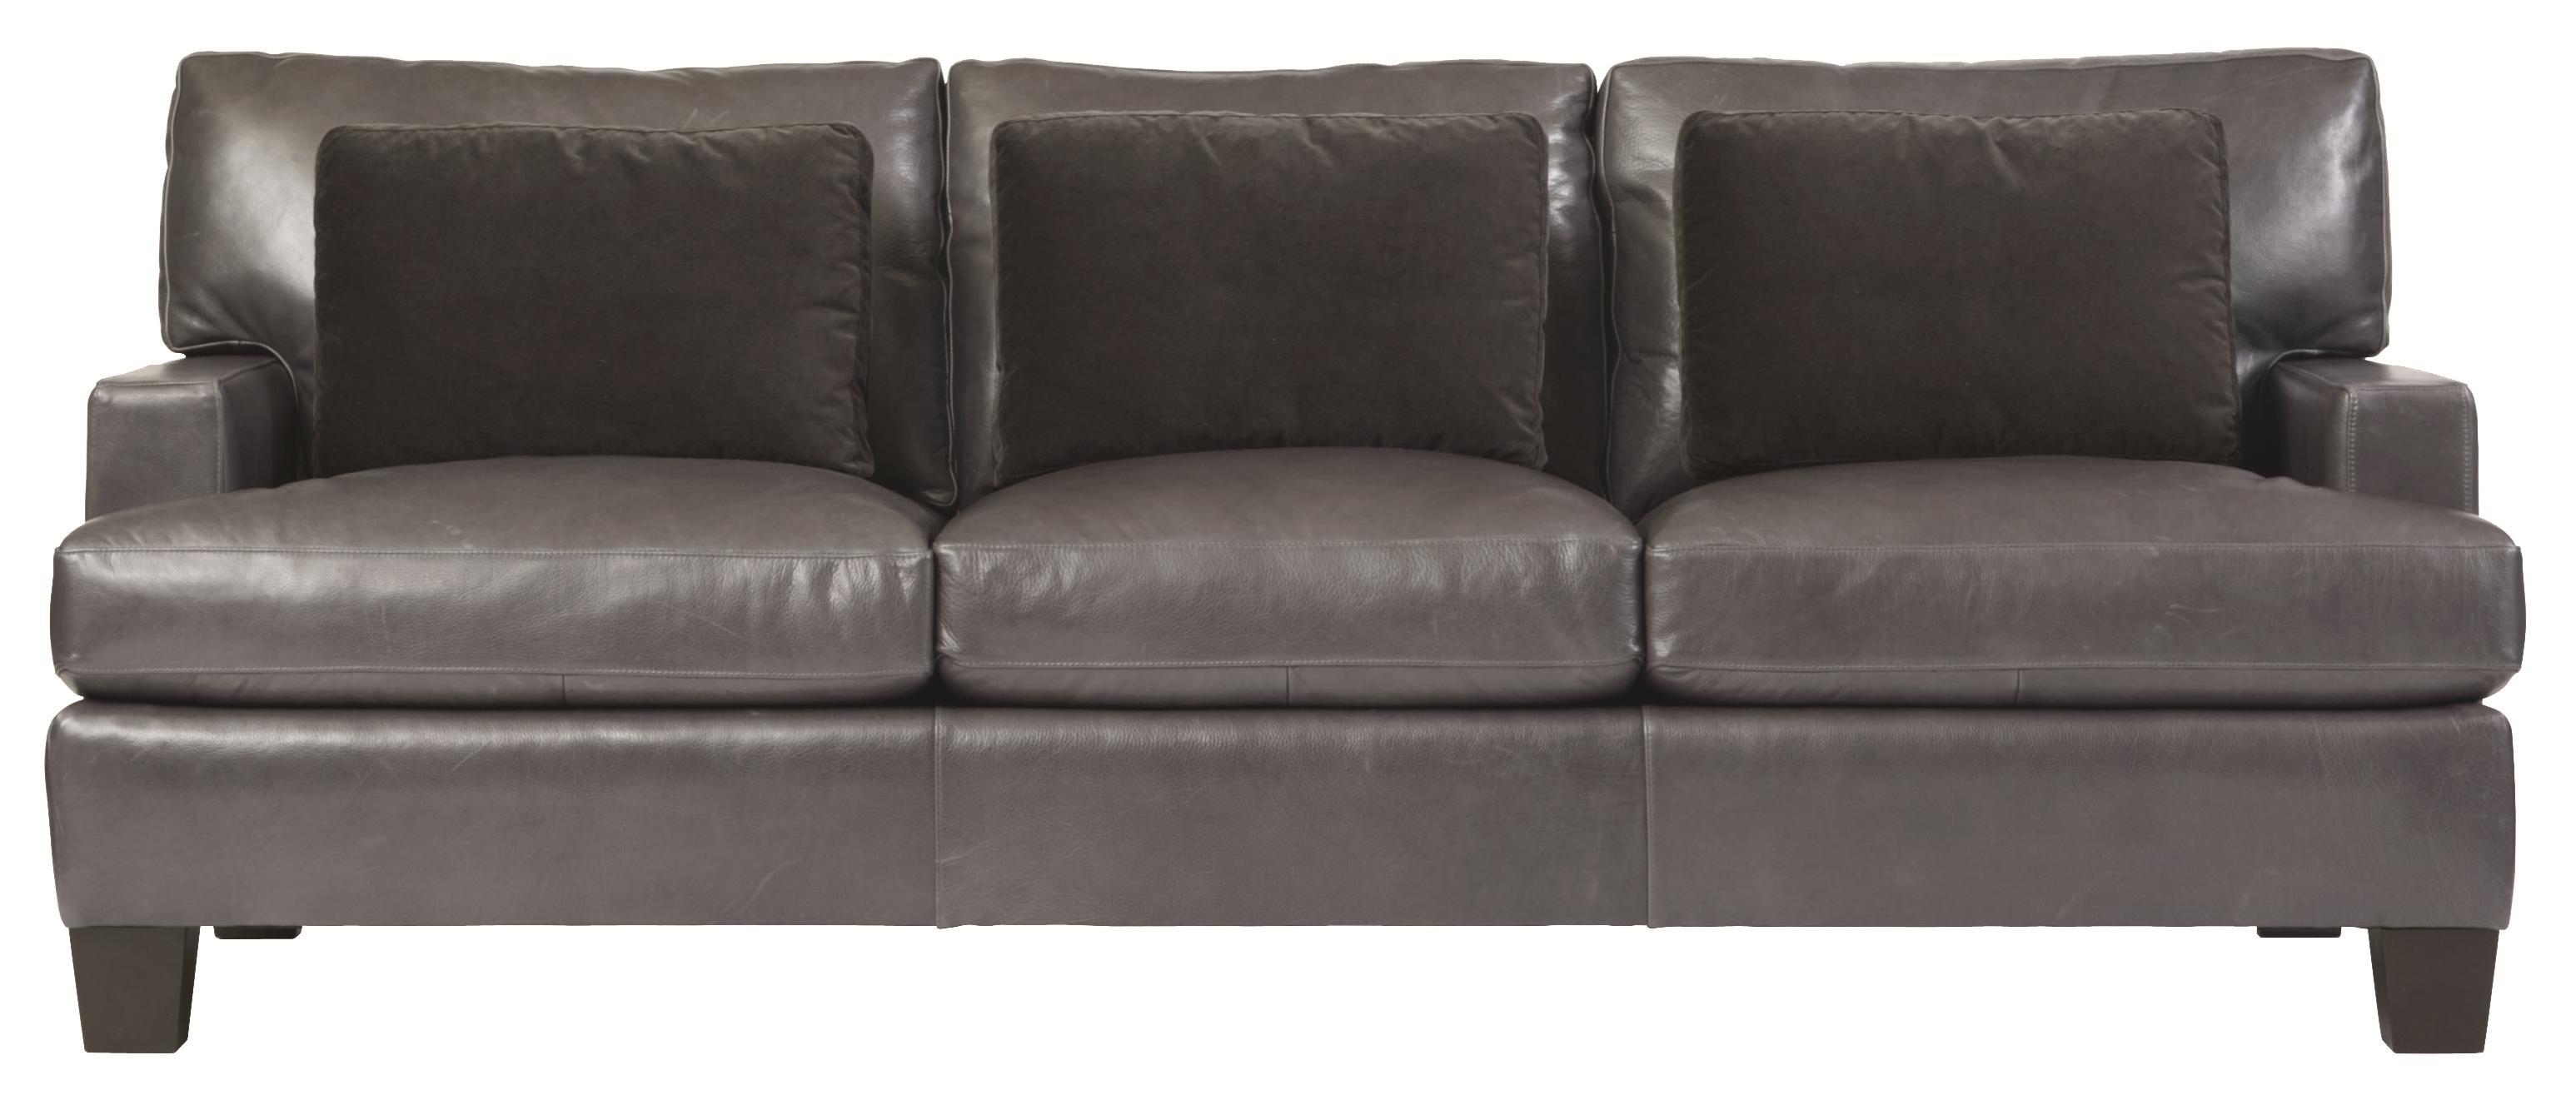 Bernhardt Interiors   Denton N6667L Stationary Sofa In Modern Furniture  Style